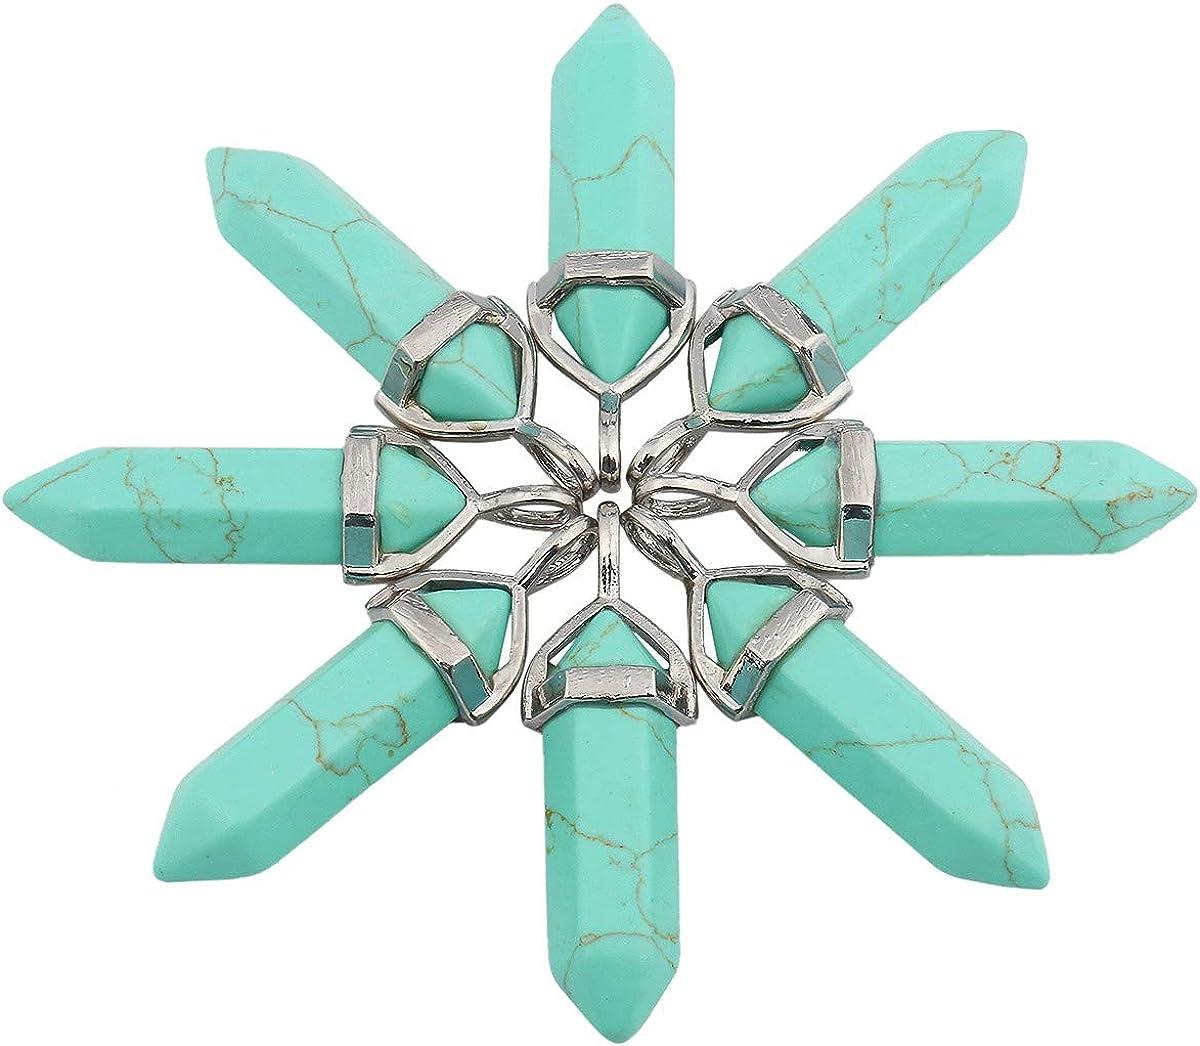 mookaitedecor Collier Hexagonal Pierre Pointe Pendentif Prisme Cristal Pointu Semi Precieuse Gu/érison Protection